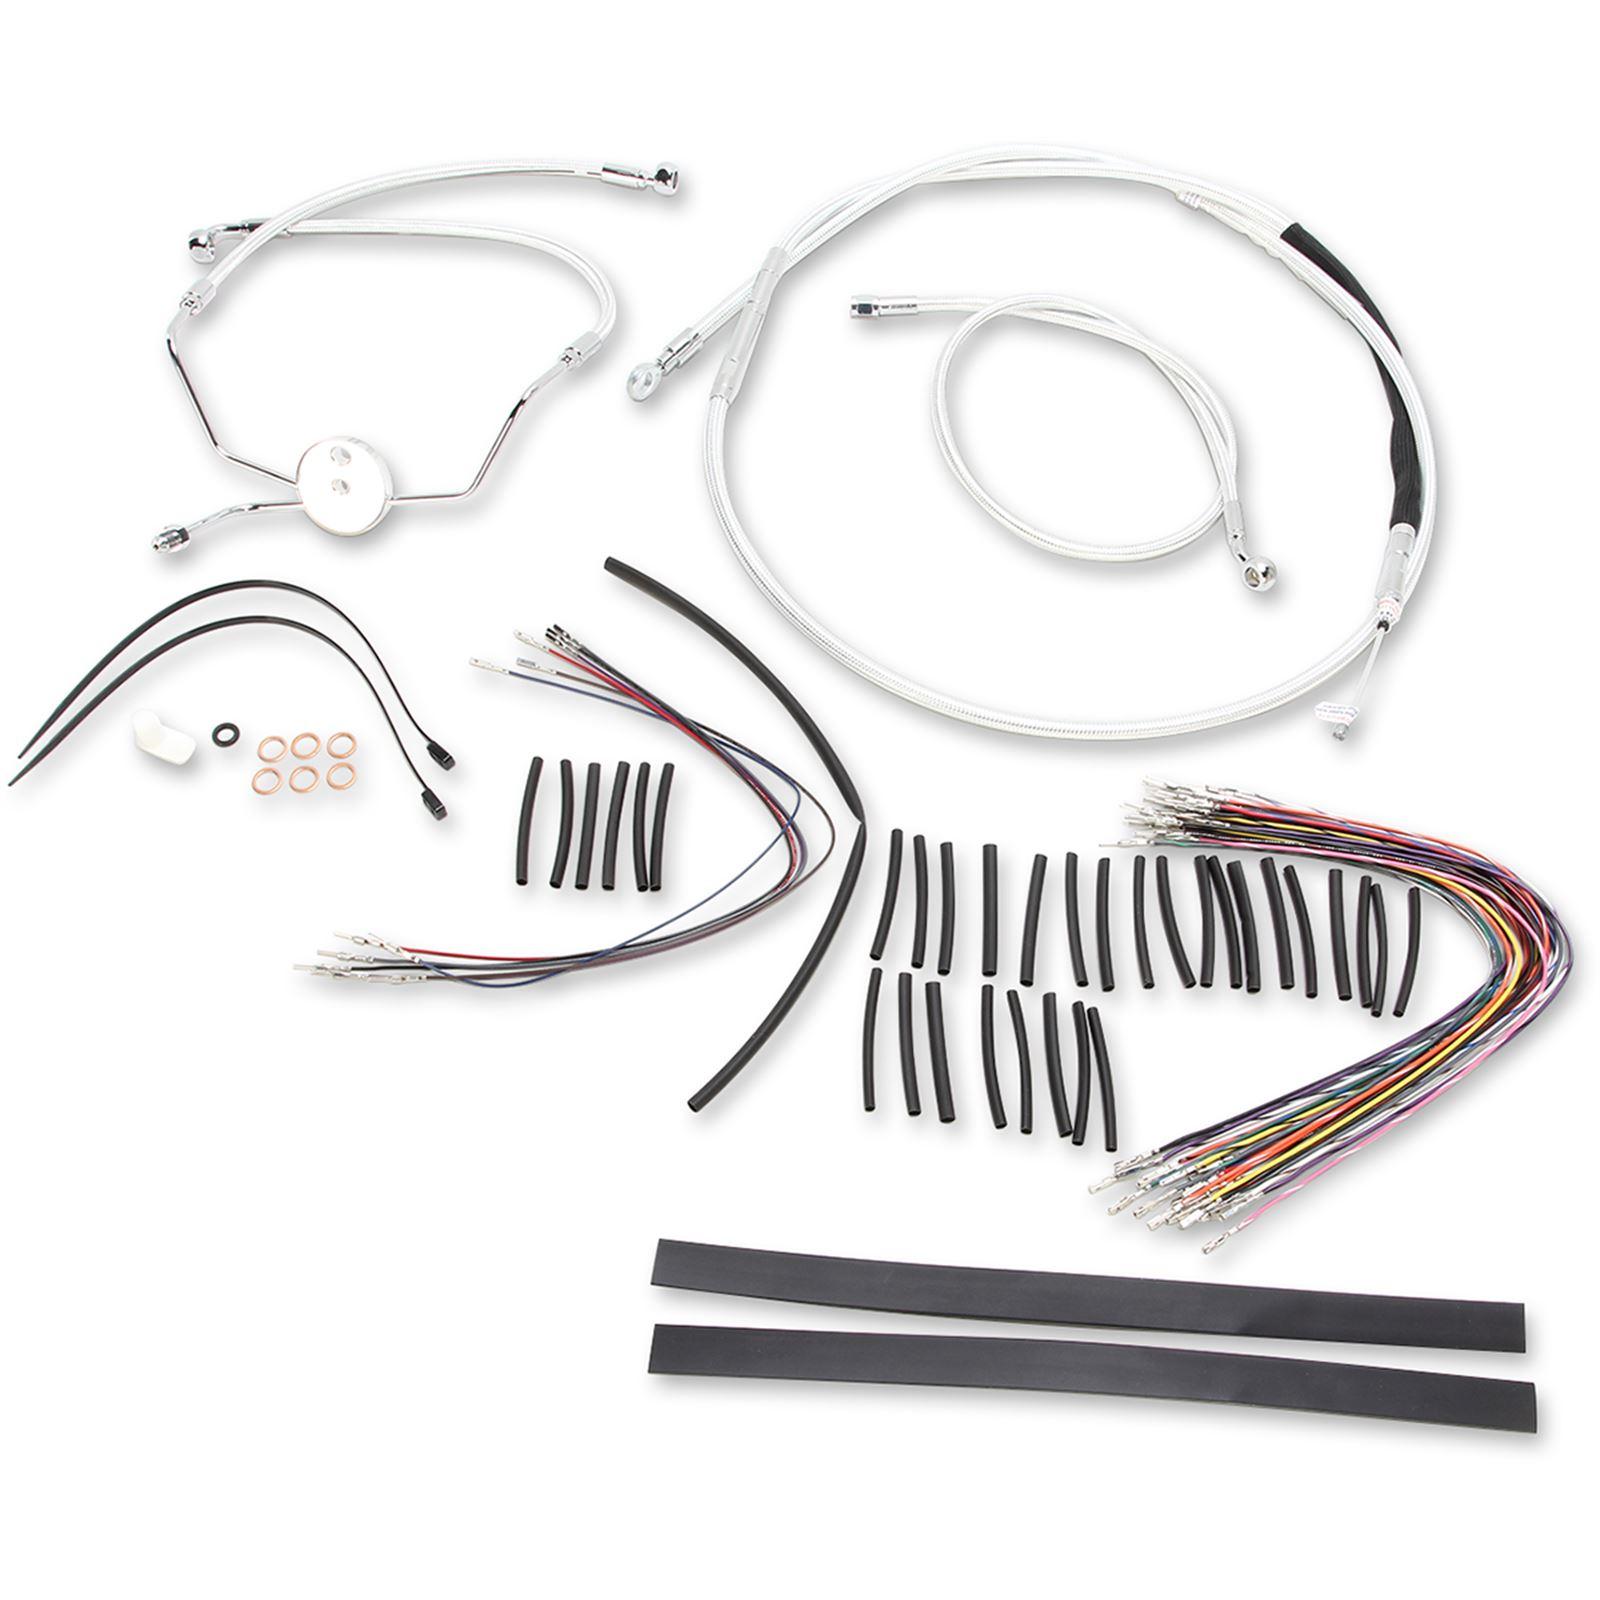 Magnum Sterling Chromite II® Handlebar and Installation Kit